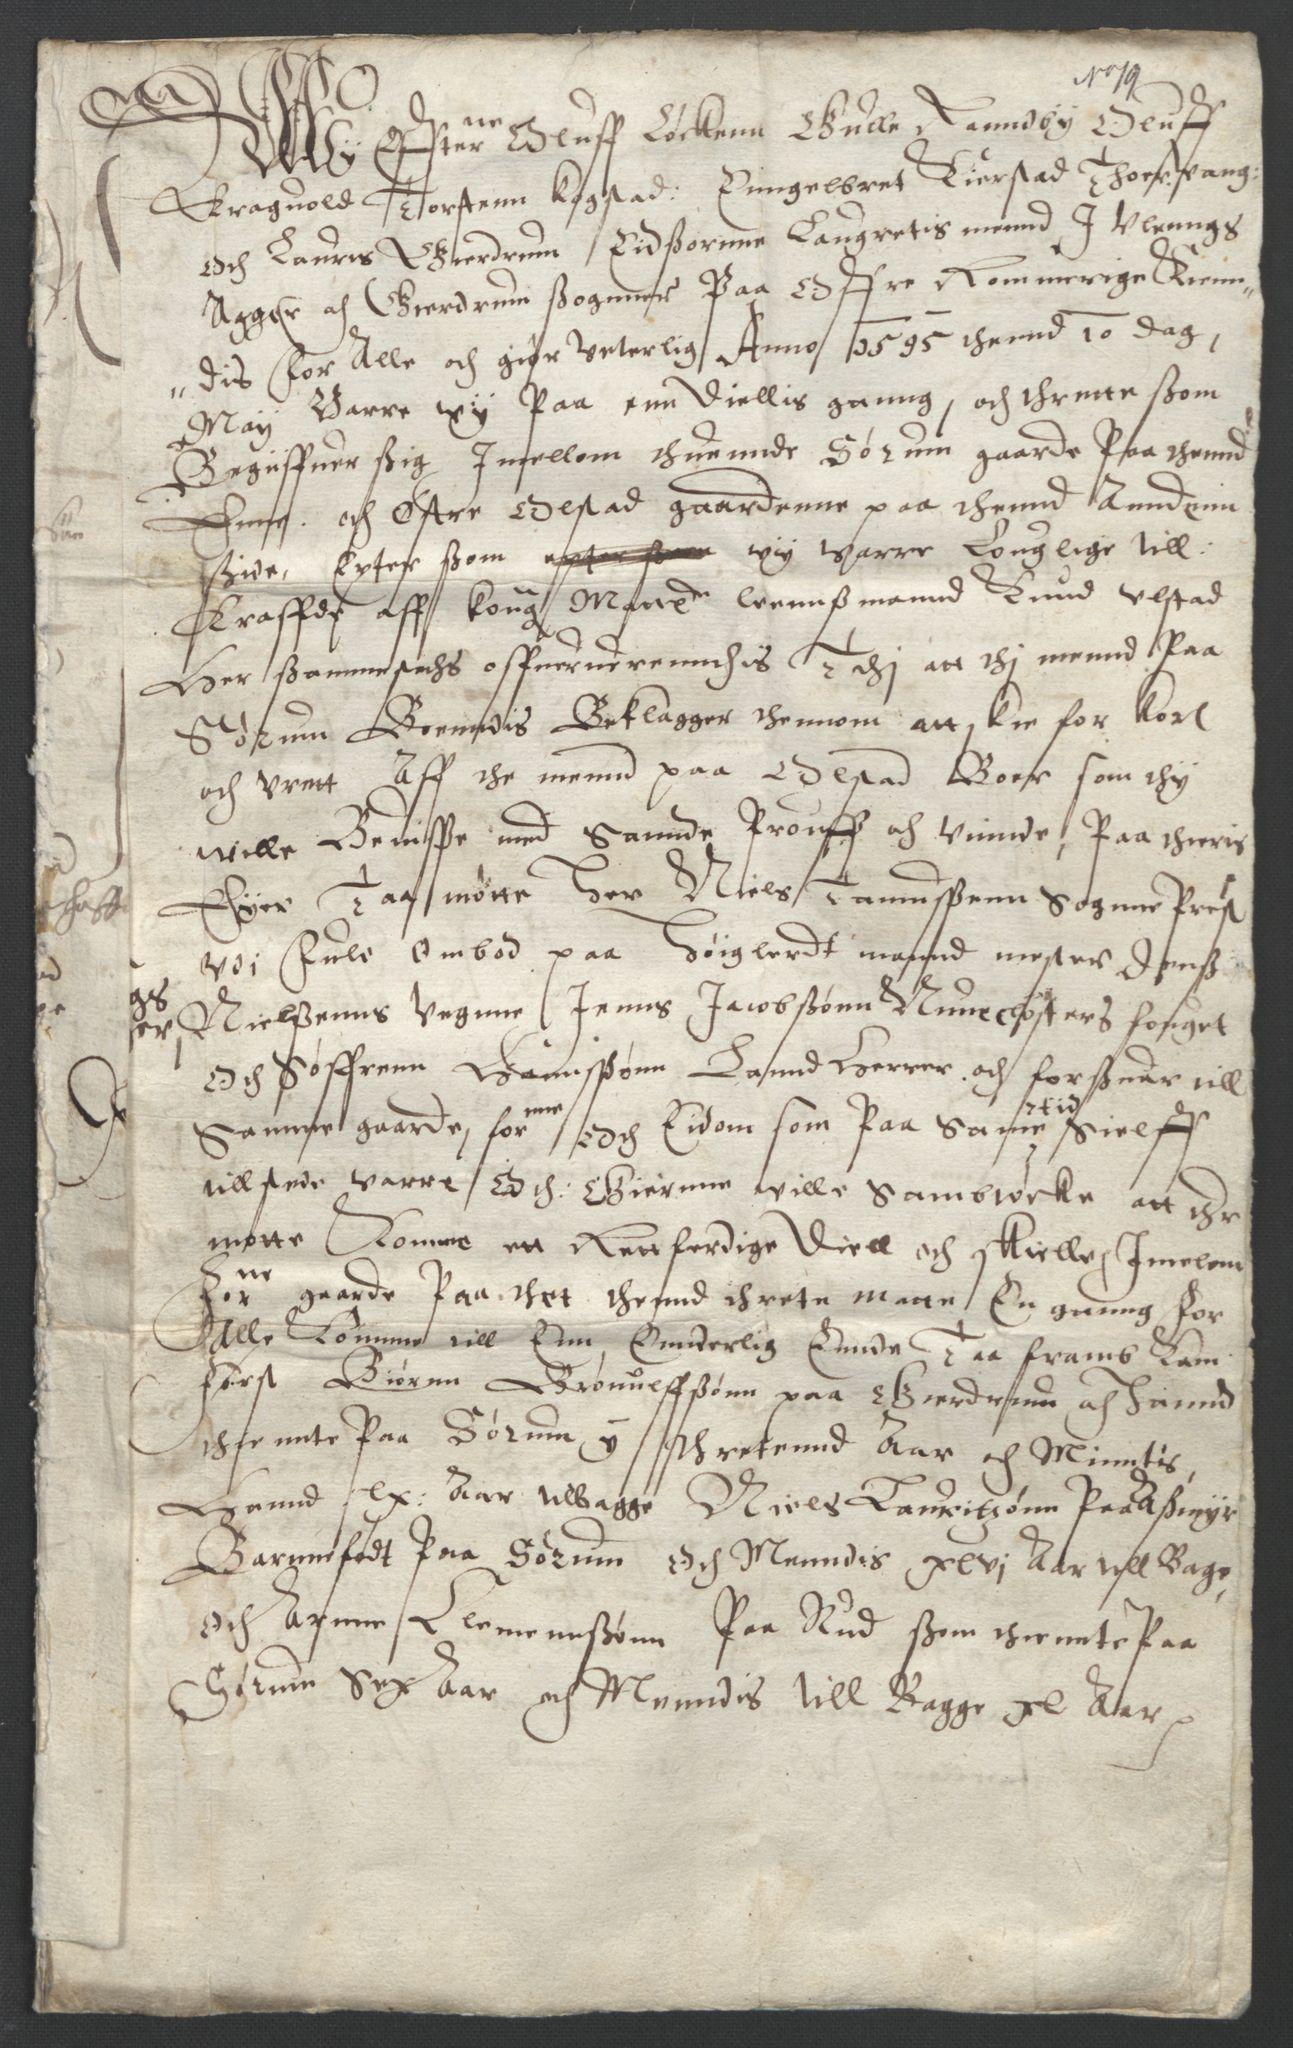 SAO, Oslo stiftsdireksjon, G/Gb/L0001: Bispestolens dokumenter, 1584-1612, s. 19